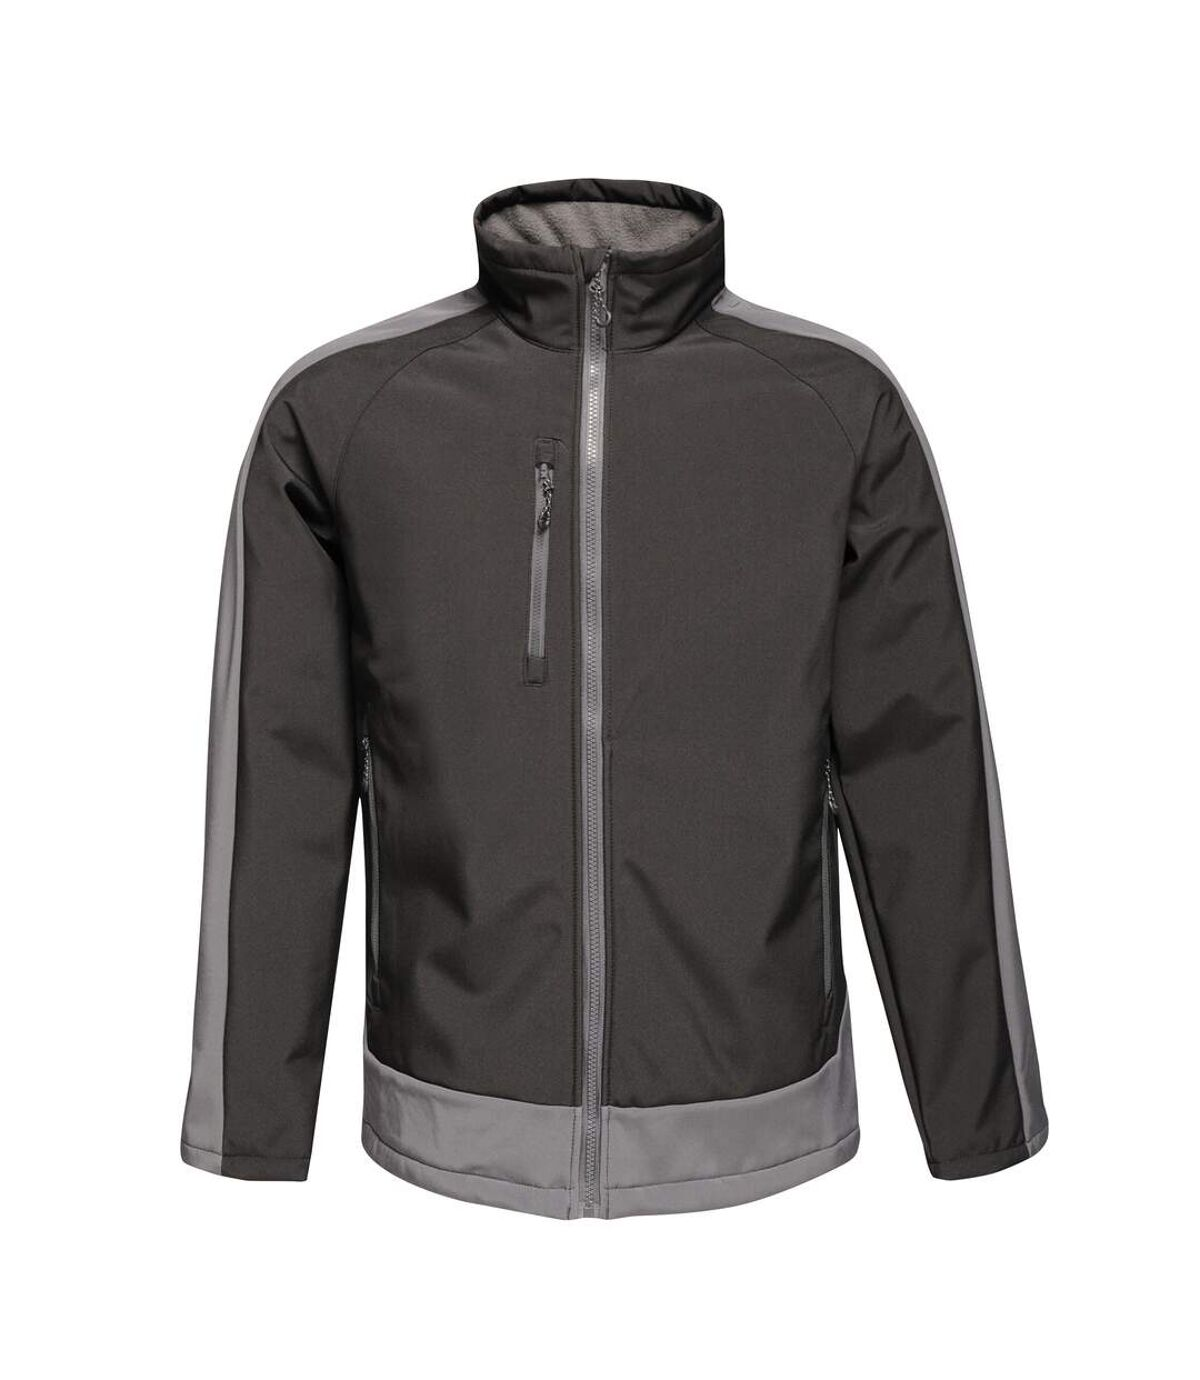 Regatta Contrast Mens 3-Layer Printable Softshell Jacket (Black/Seal) - UTRW6355